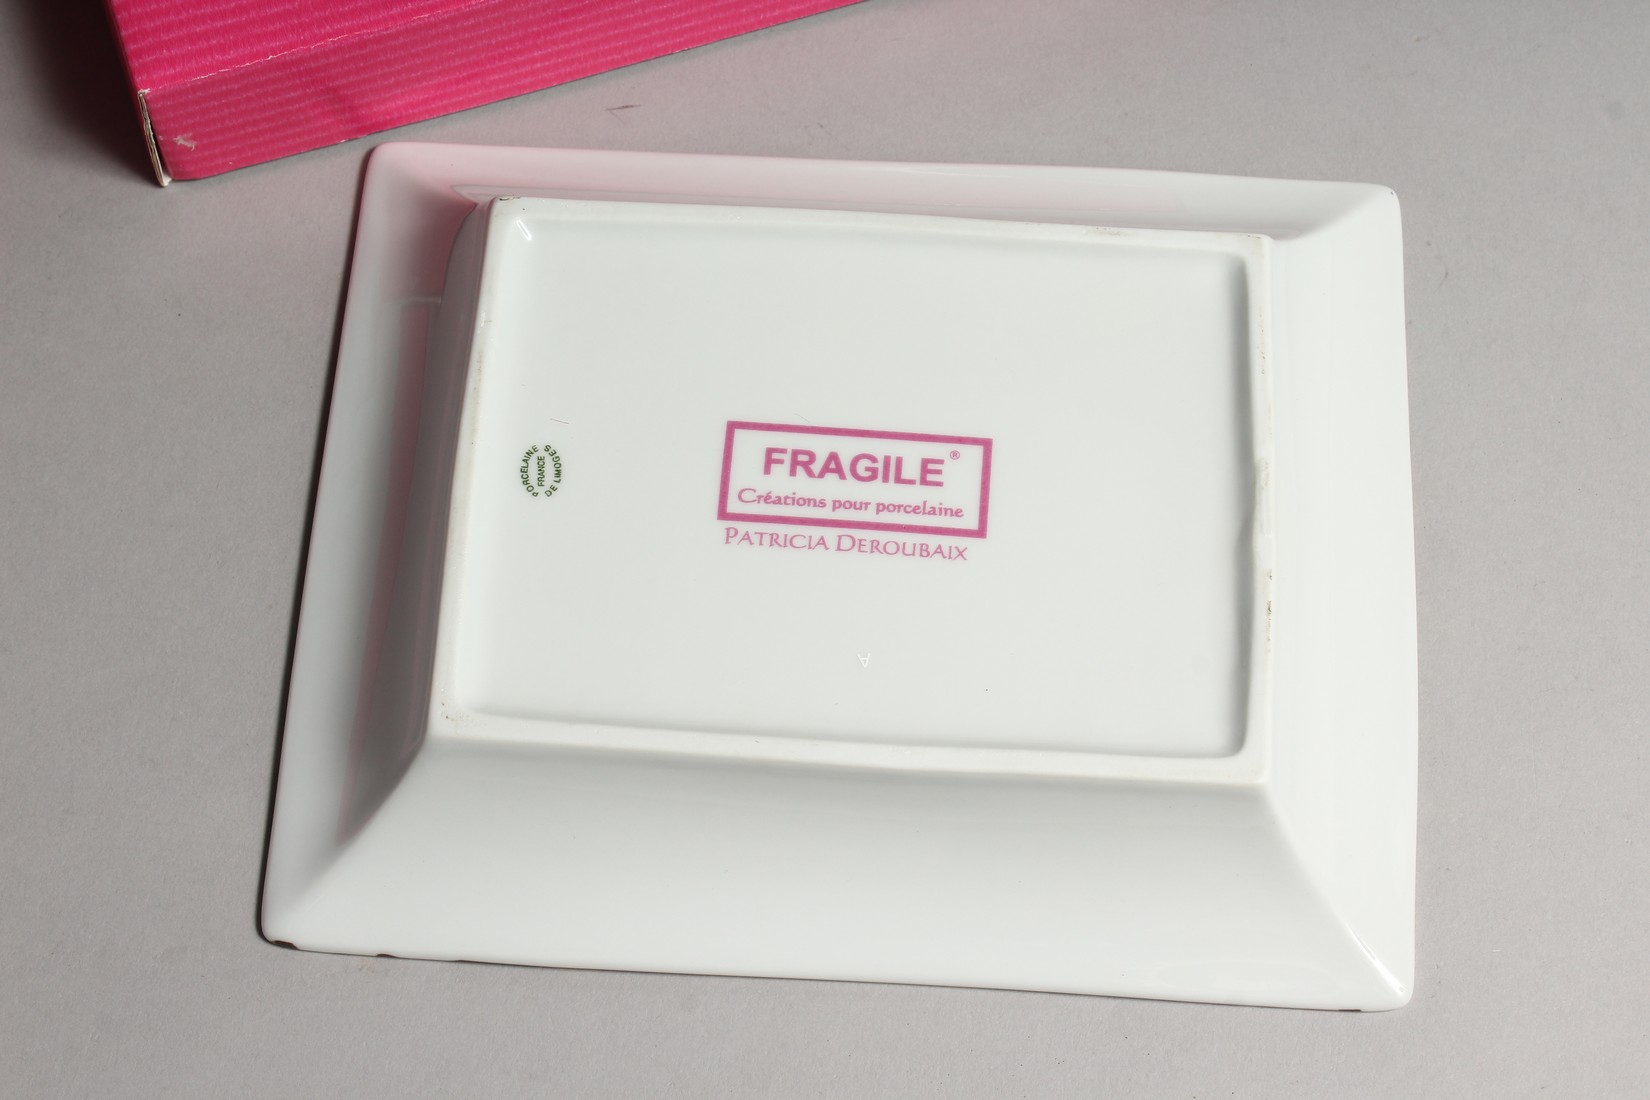 A PATRICIA DEROUBAIX LEMOGE LEOPARD ASH TRAY in a box. - Image 3 of 3